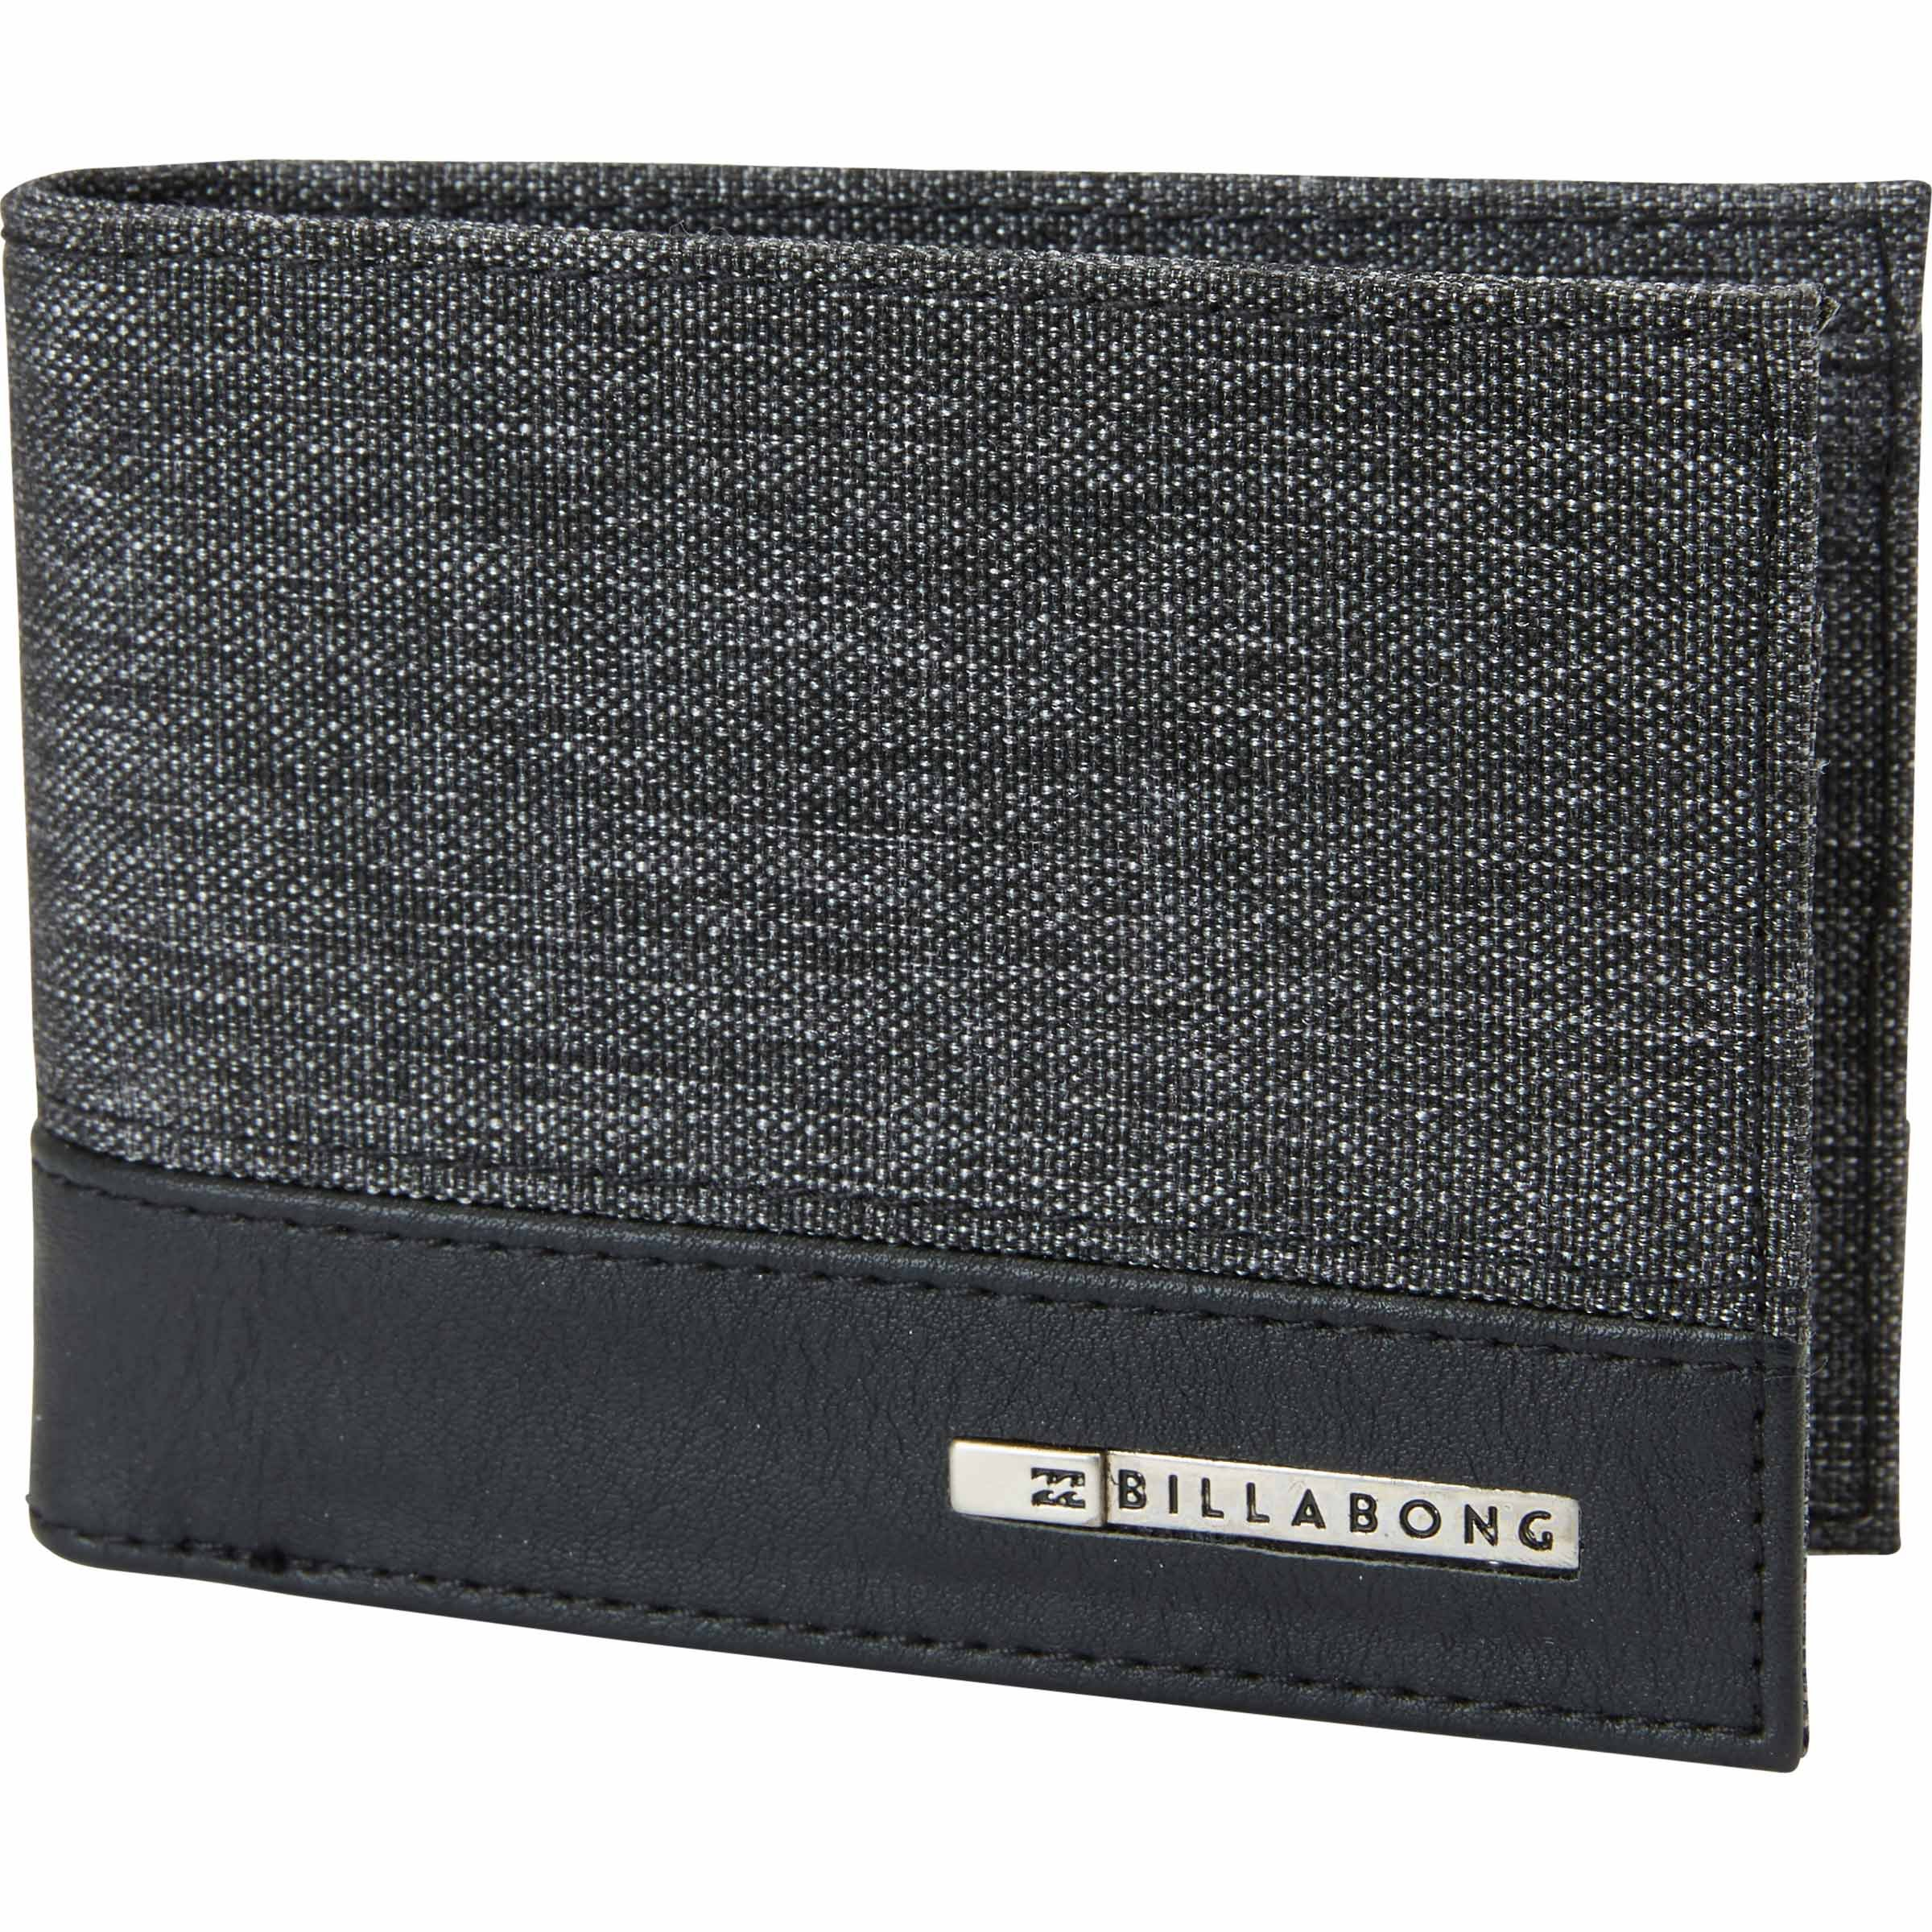 Billabong Dimension Wallet Accessory